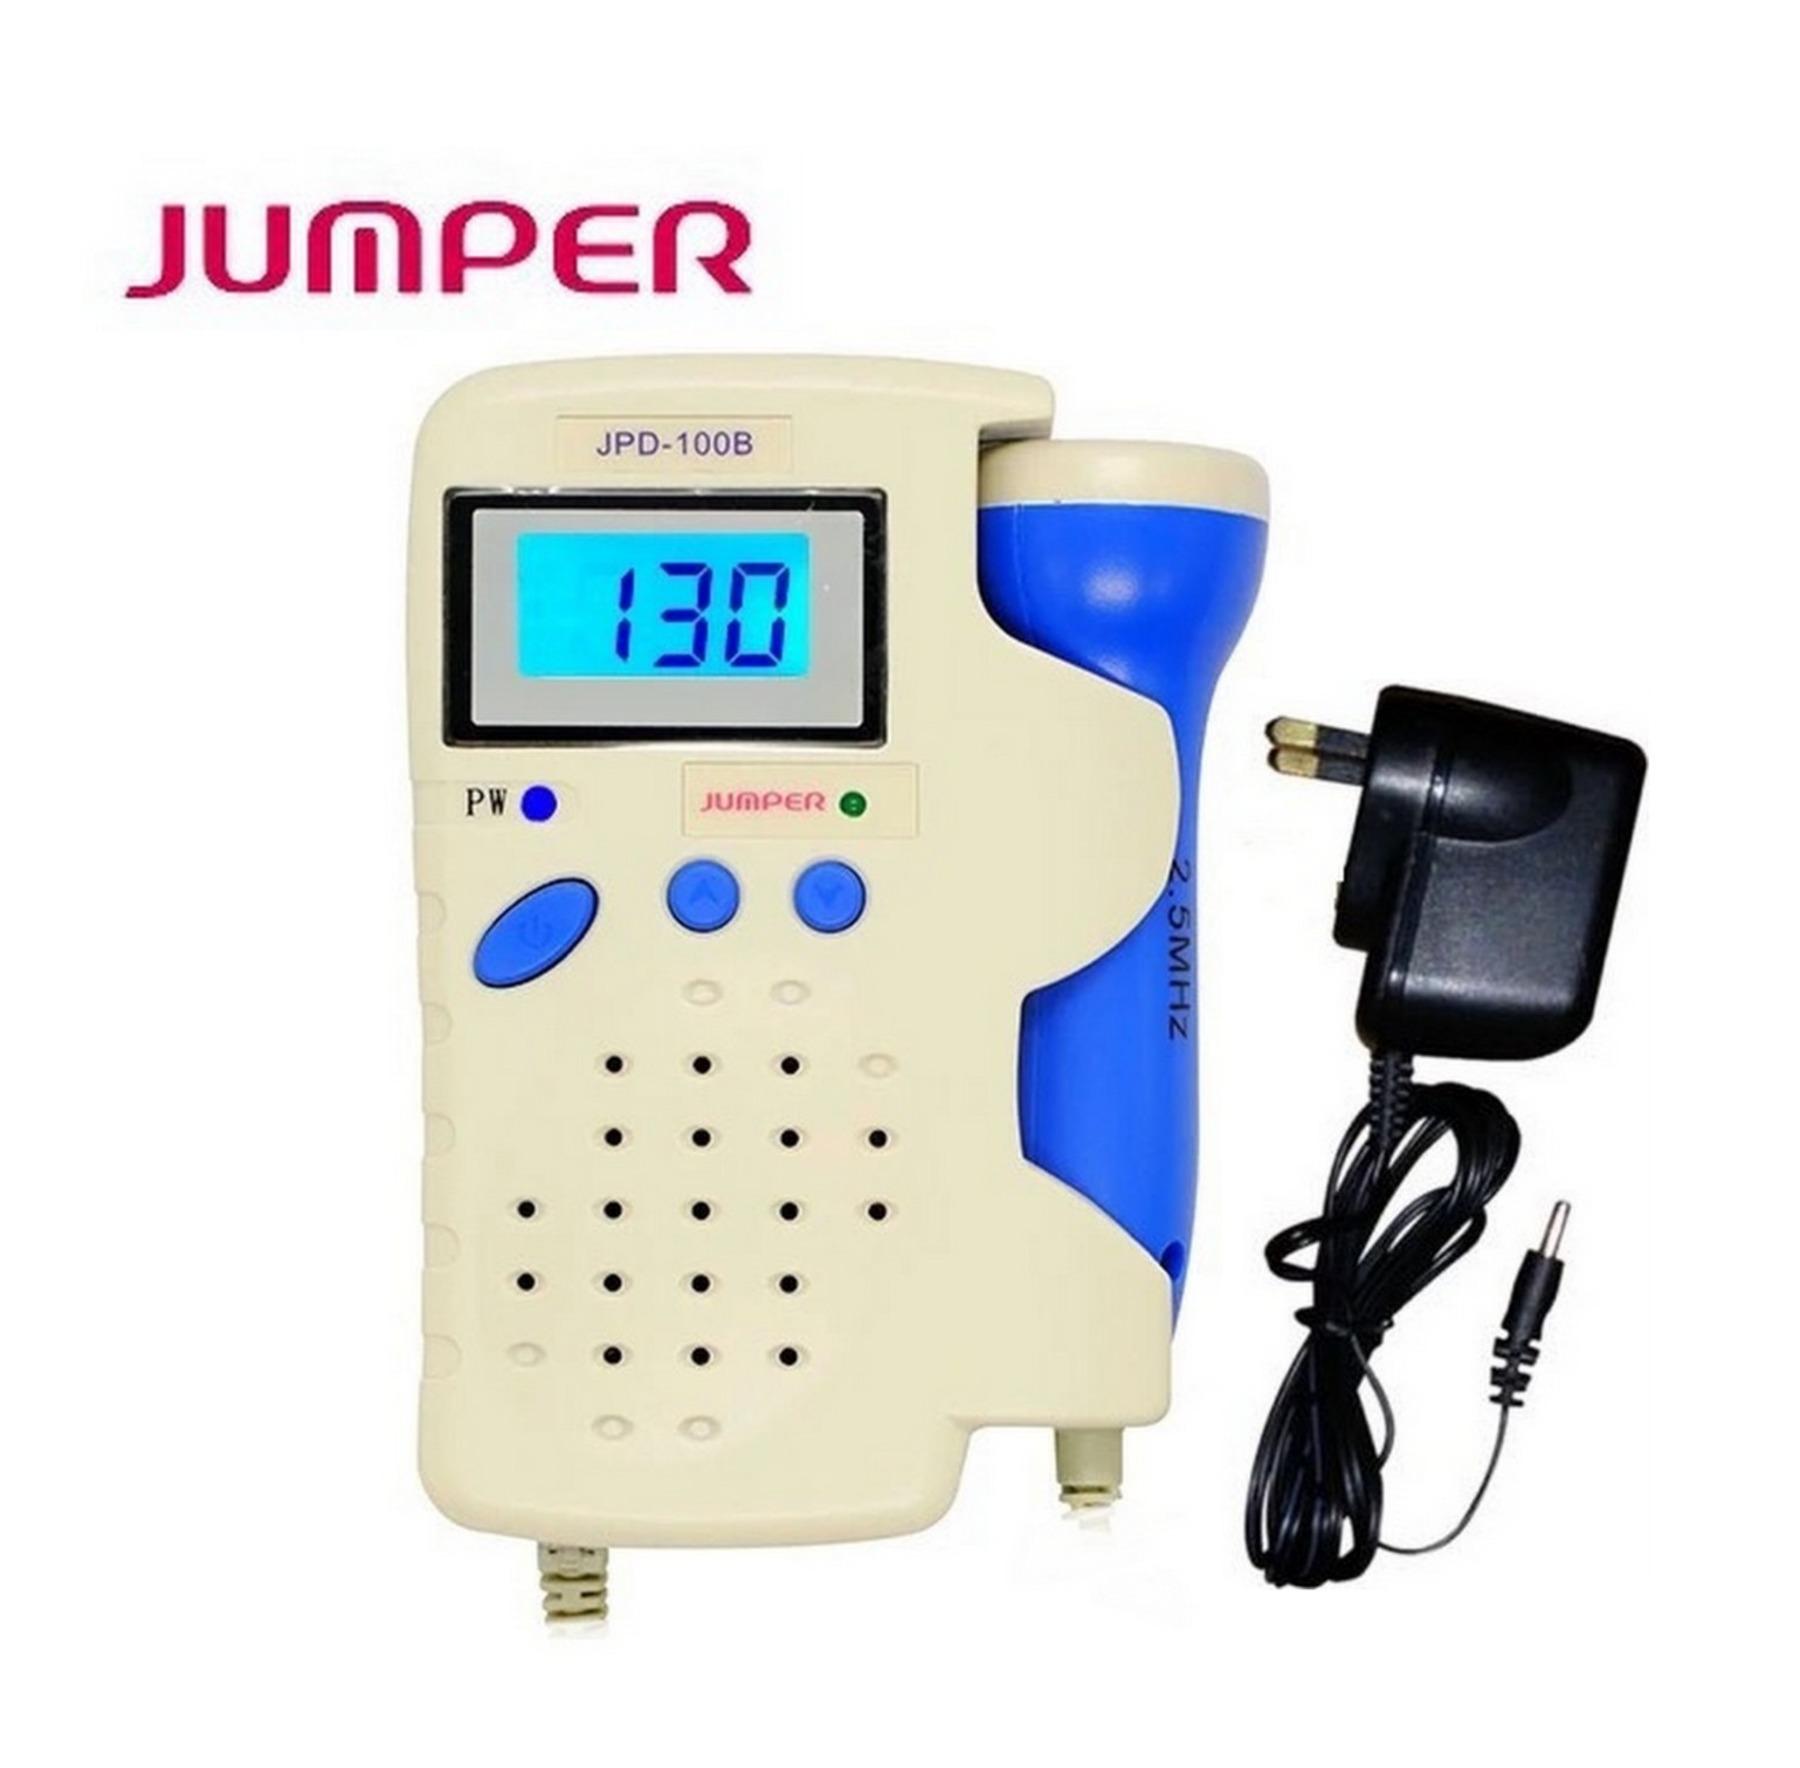 Допплер персональный<br><b> JPD-100B</b>